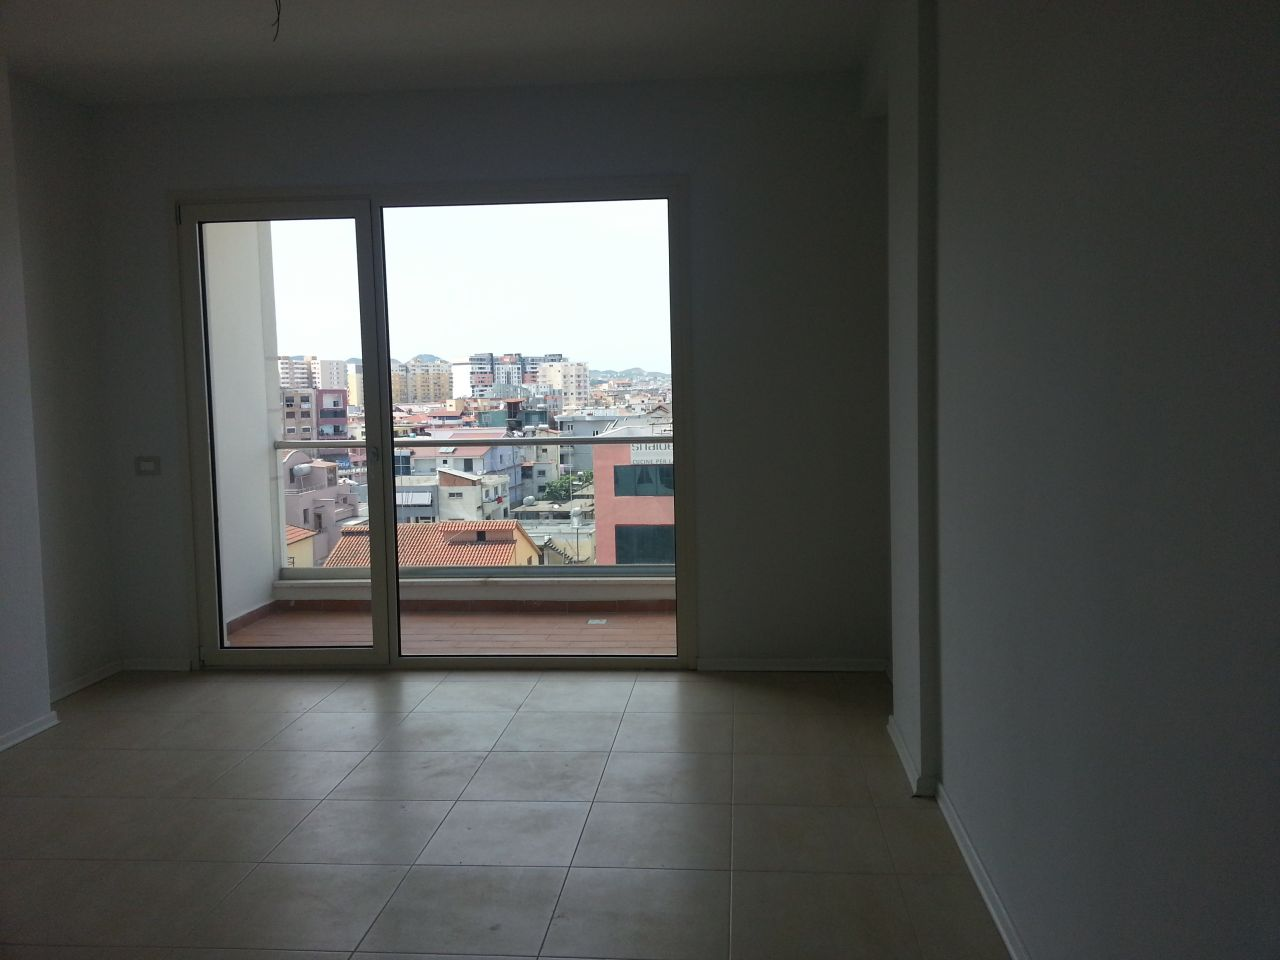 apartments in durres city close to the adriatic sea in albania